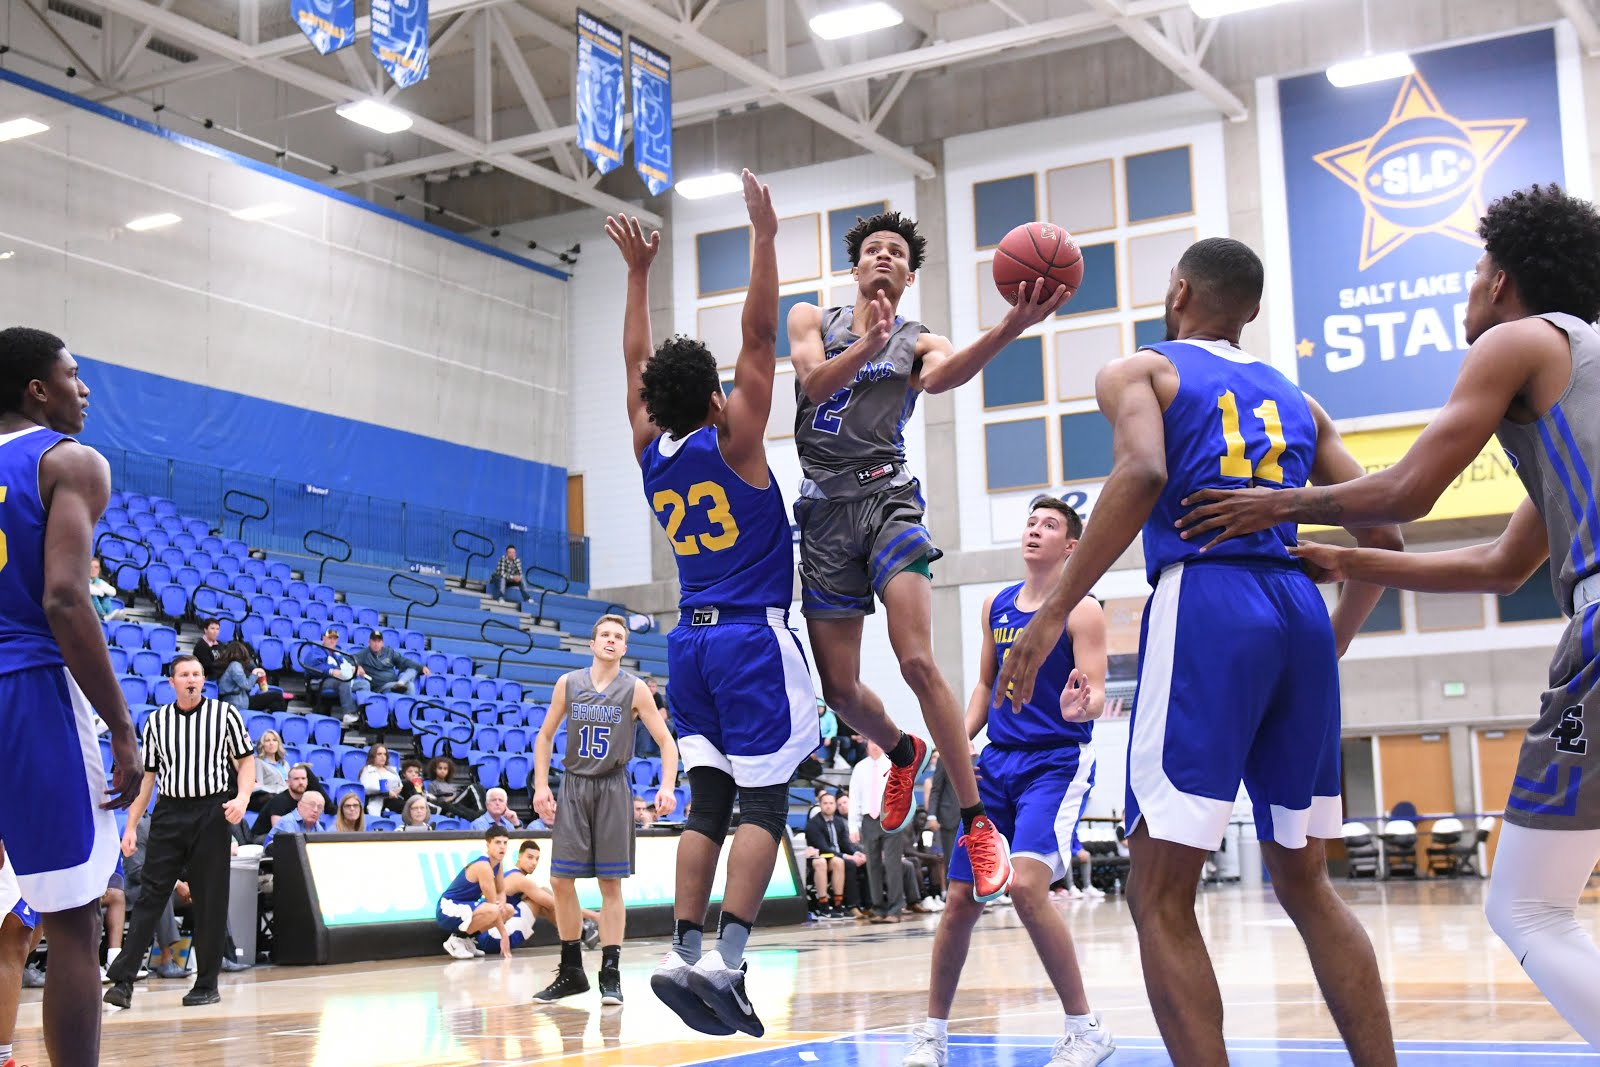 The Fountain - The Official SLCC Blog: Men's Basketball Reaches 12-0, Women 7-2